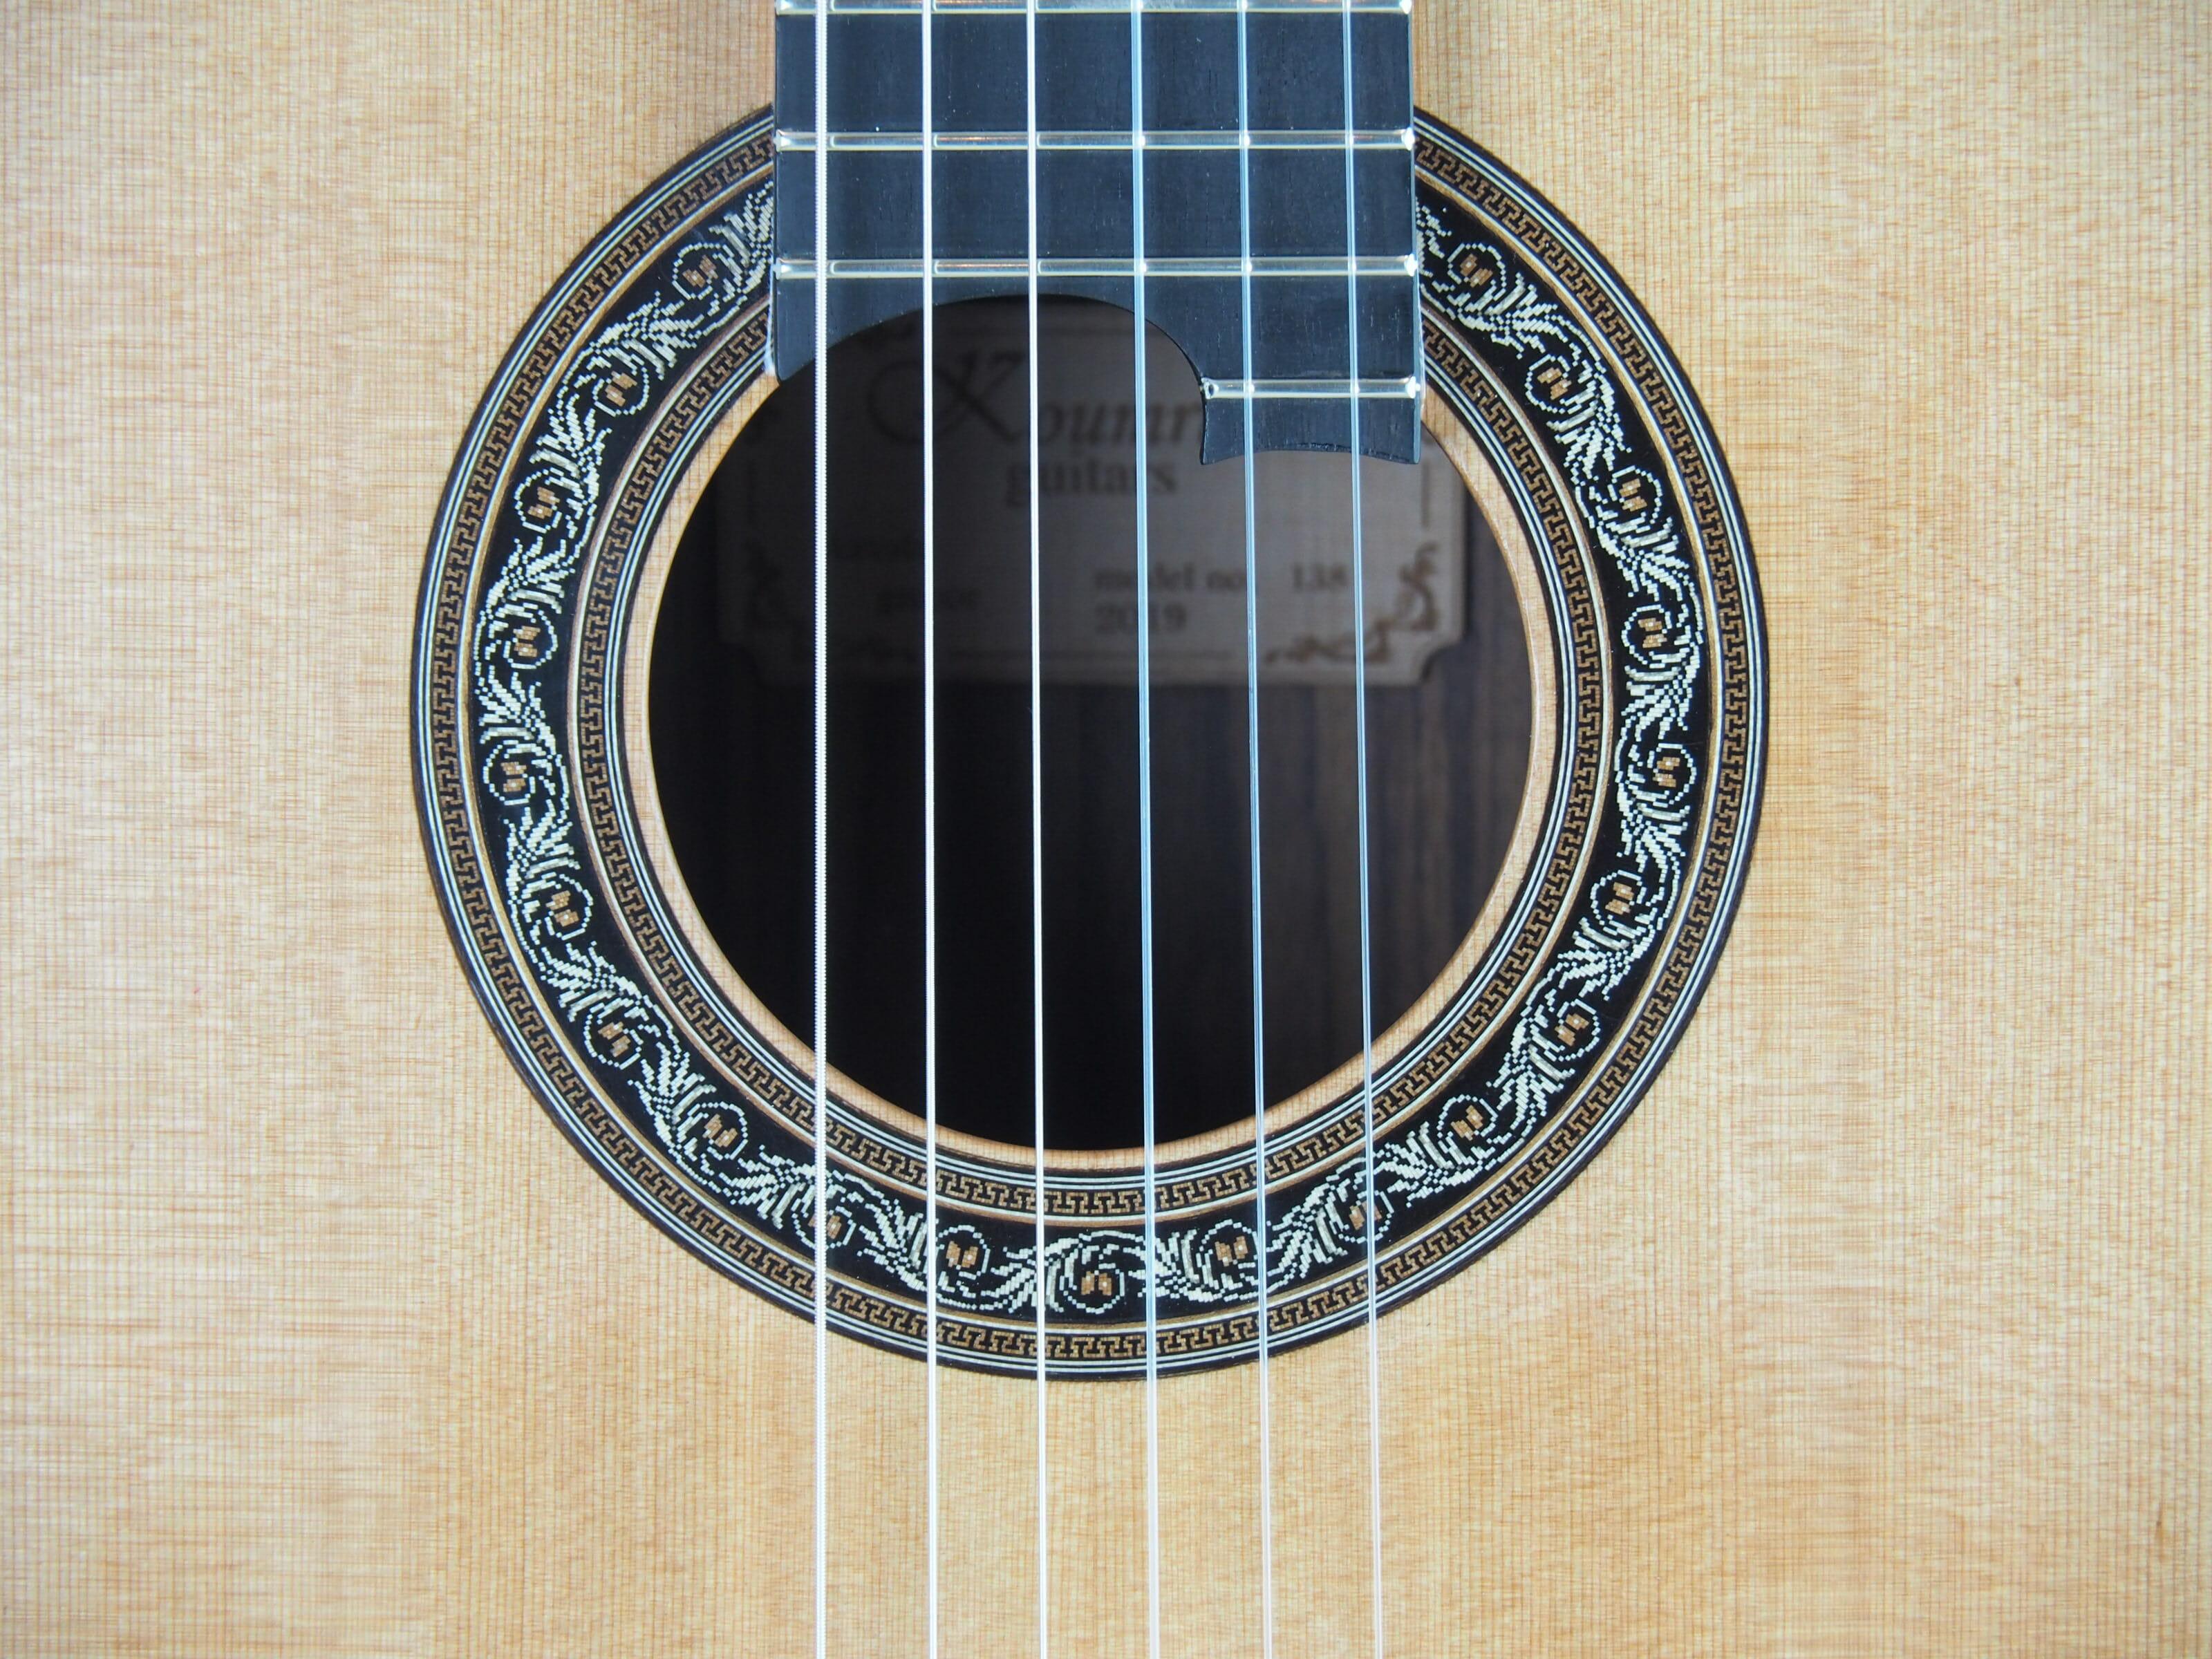 Charalampos Koumridis luthier www.guitare-classique-concert.fr No 138 19KOU138-07